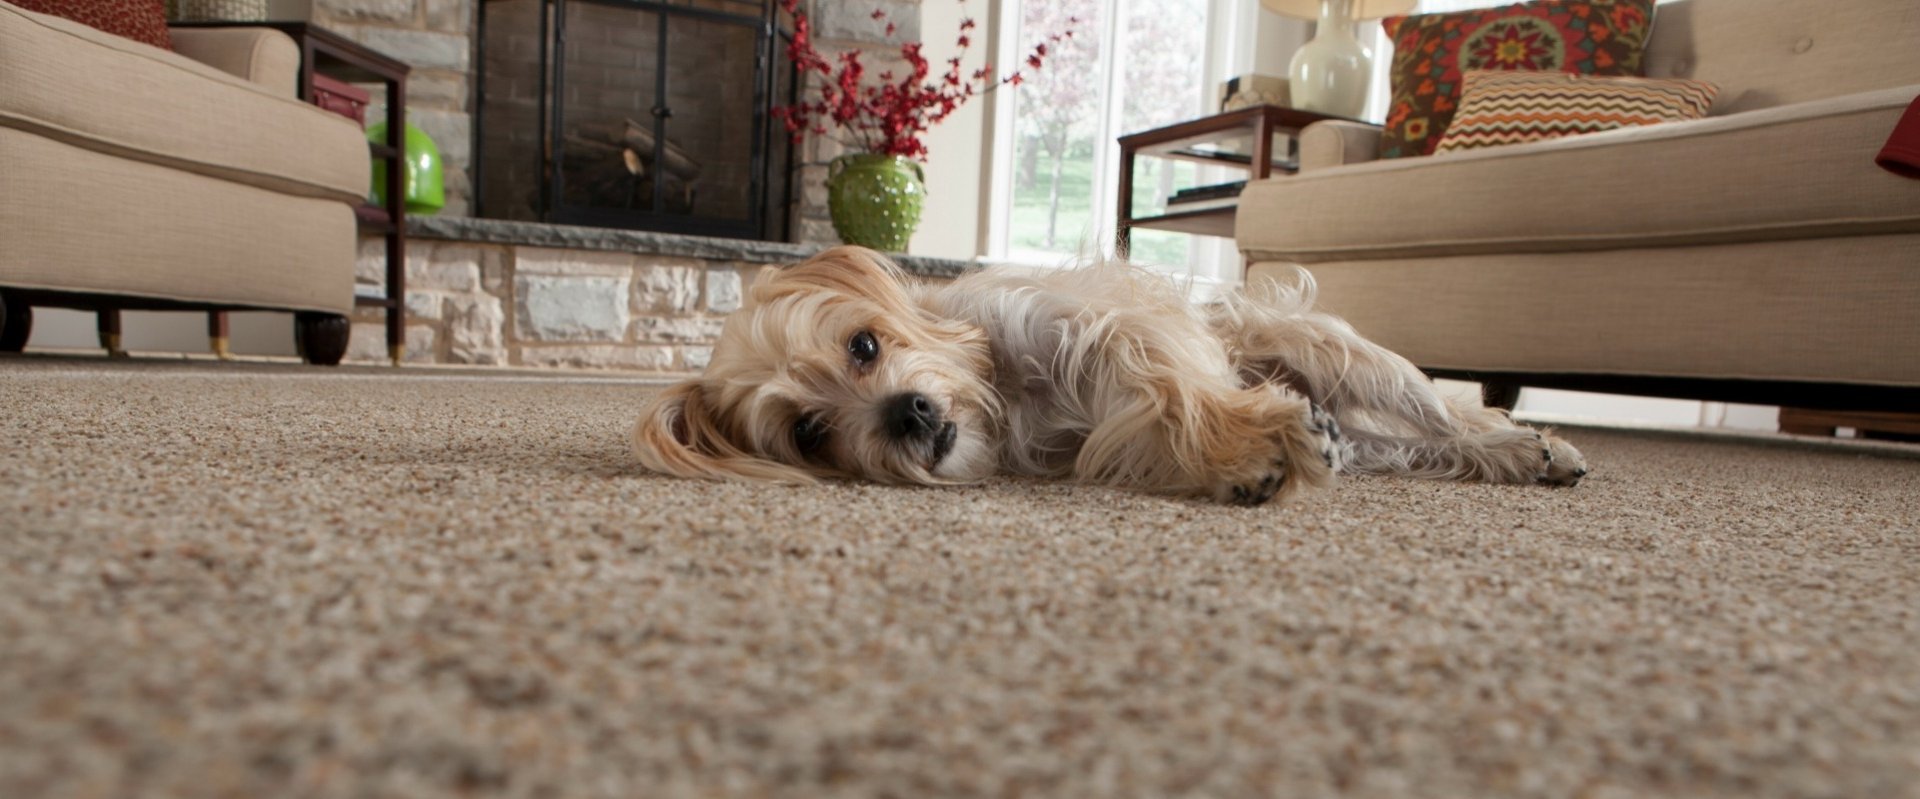 Living Room Carpeting